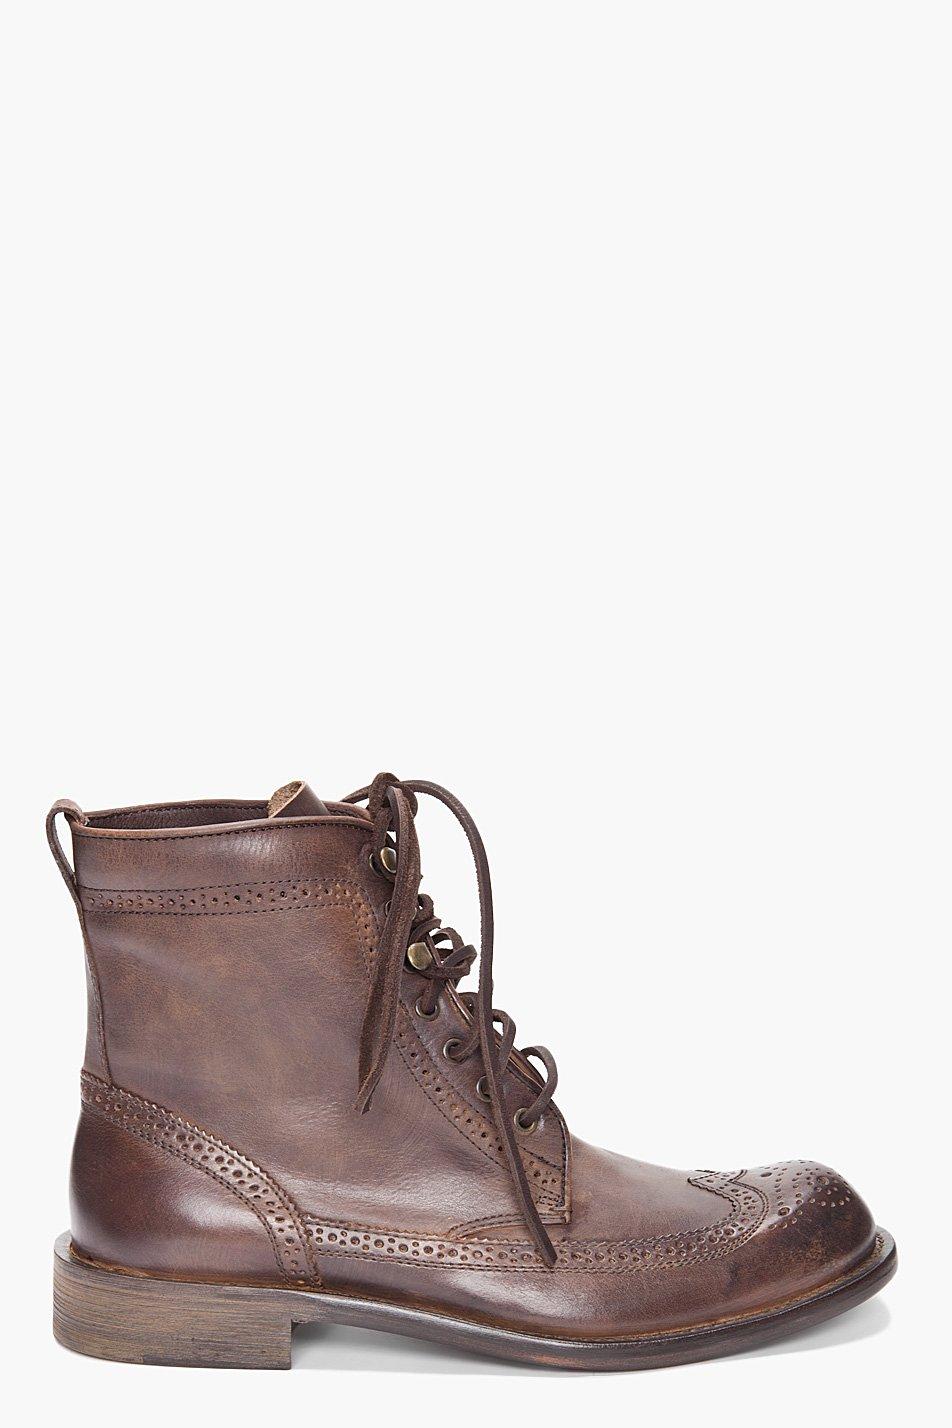 varvatos wingtip boots in brown for lyst